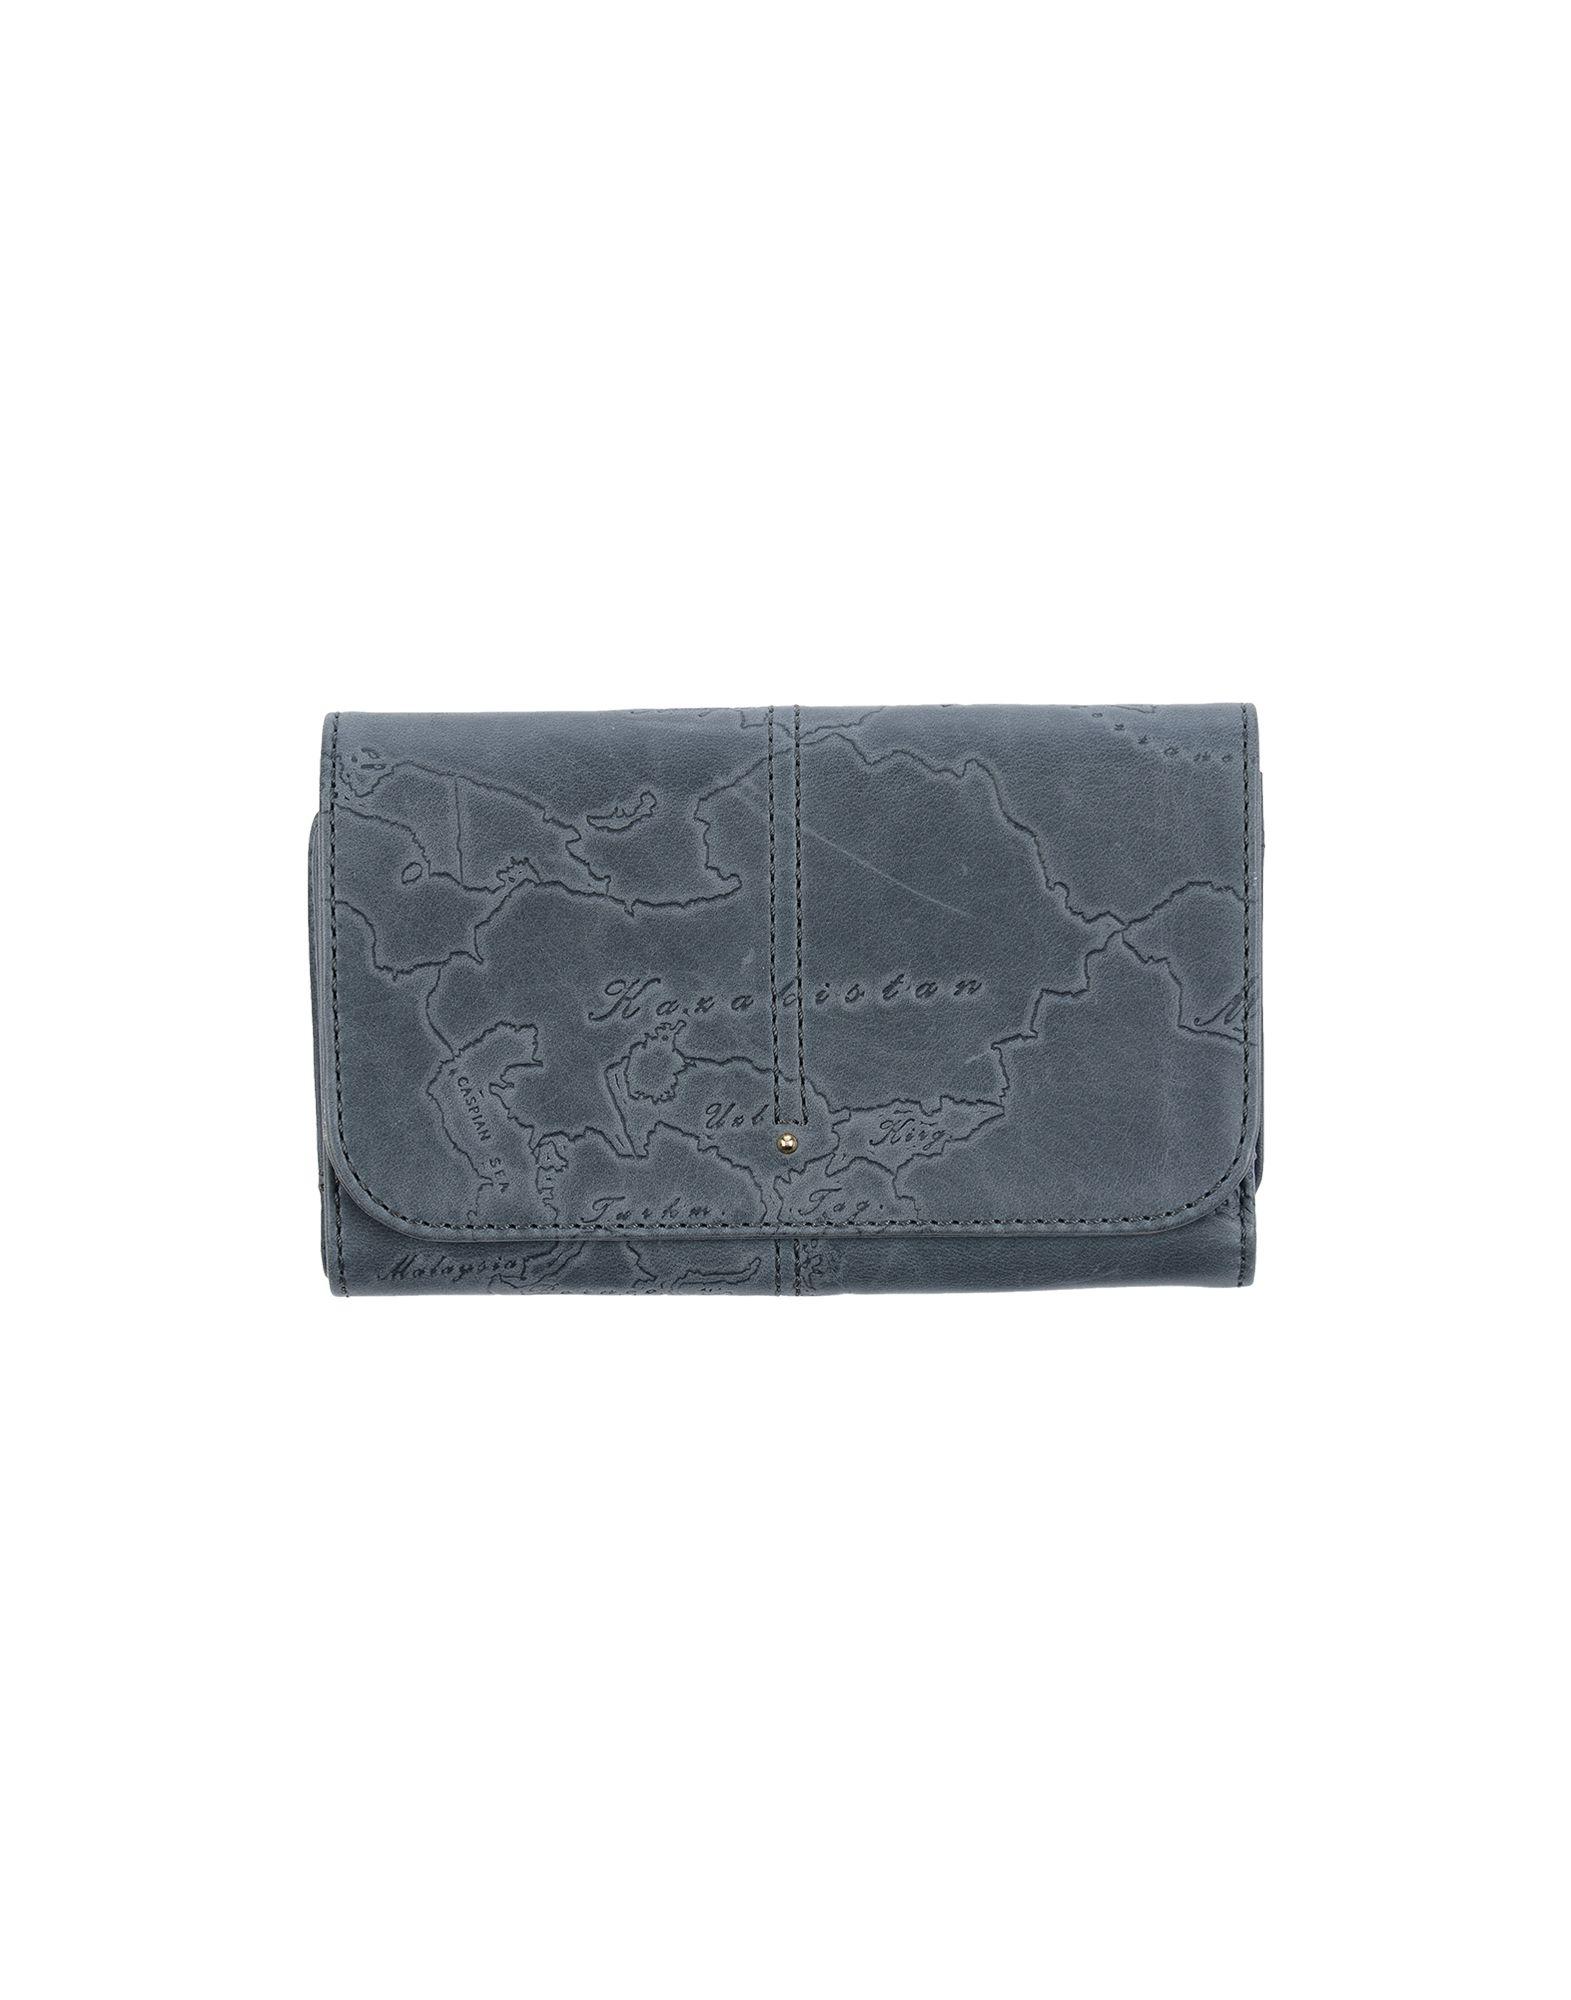 ALVIERO MARTINI 1a CLASSE Бумажник платья с принтами